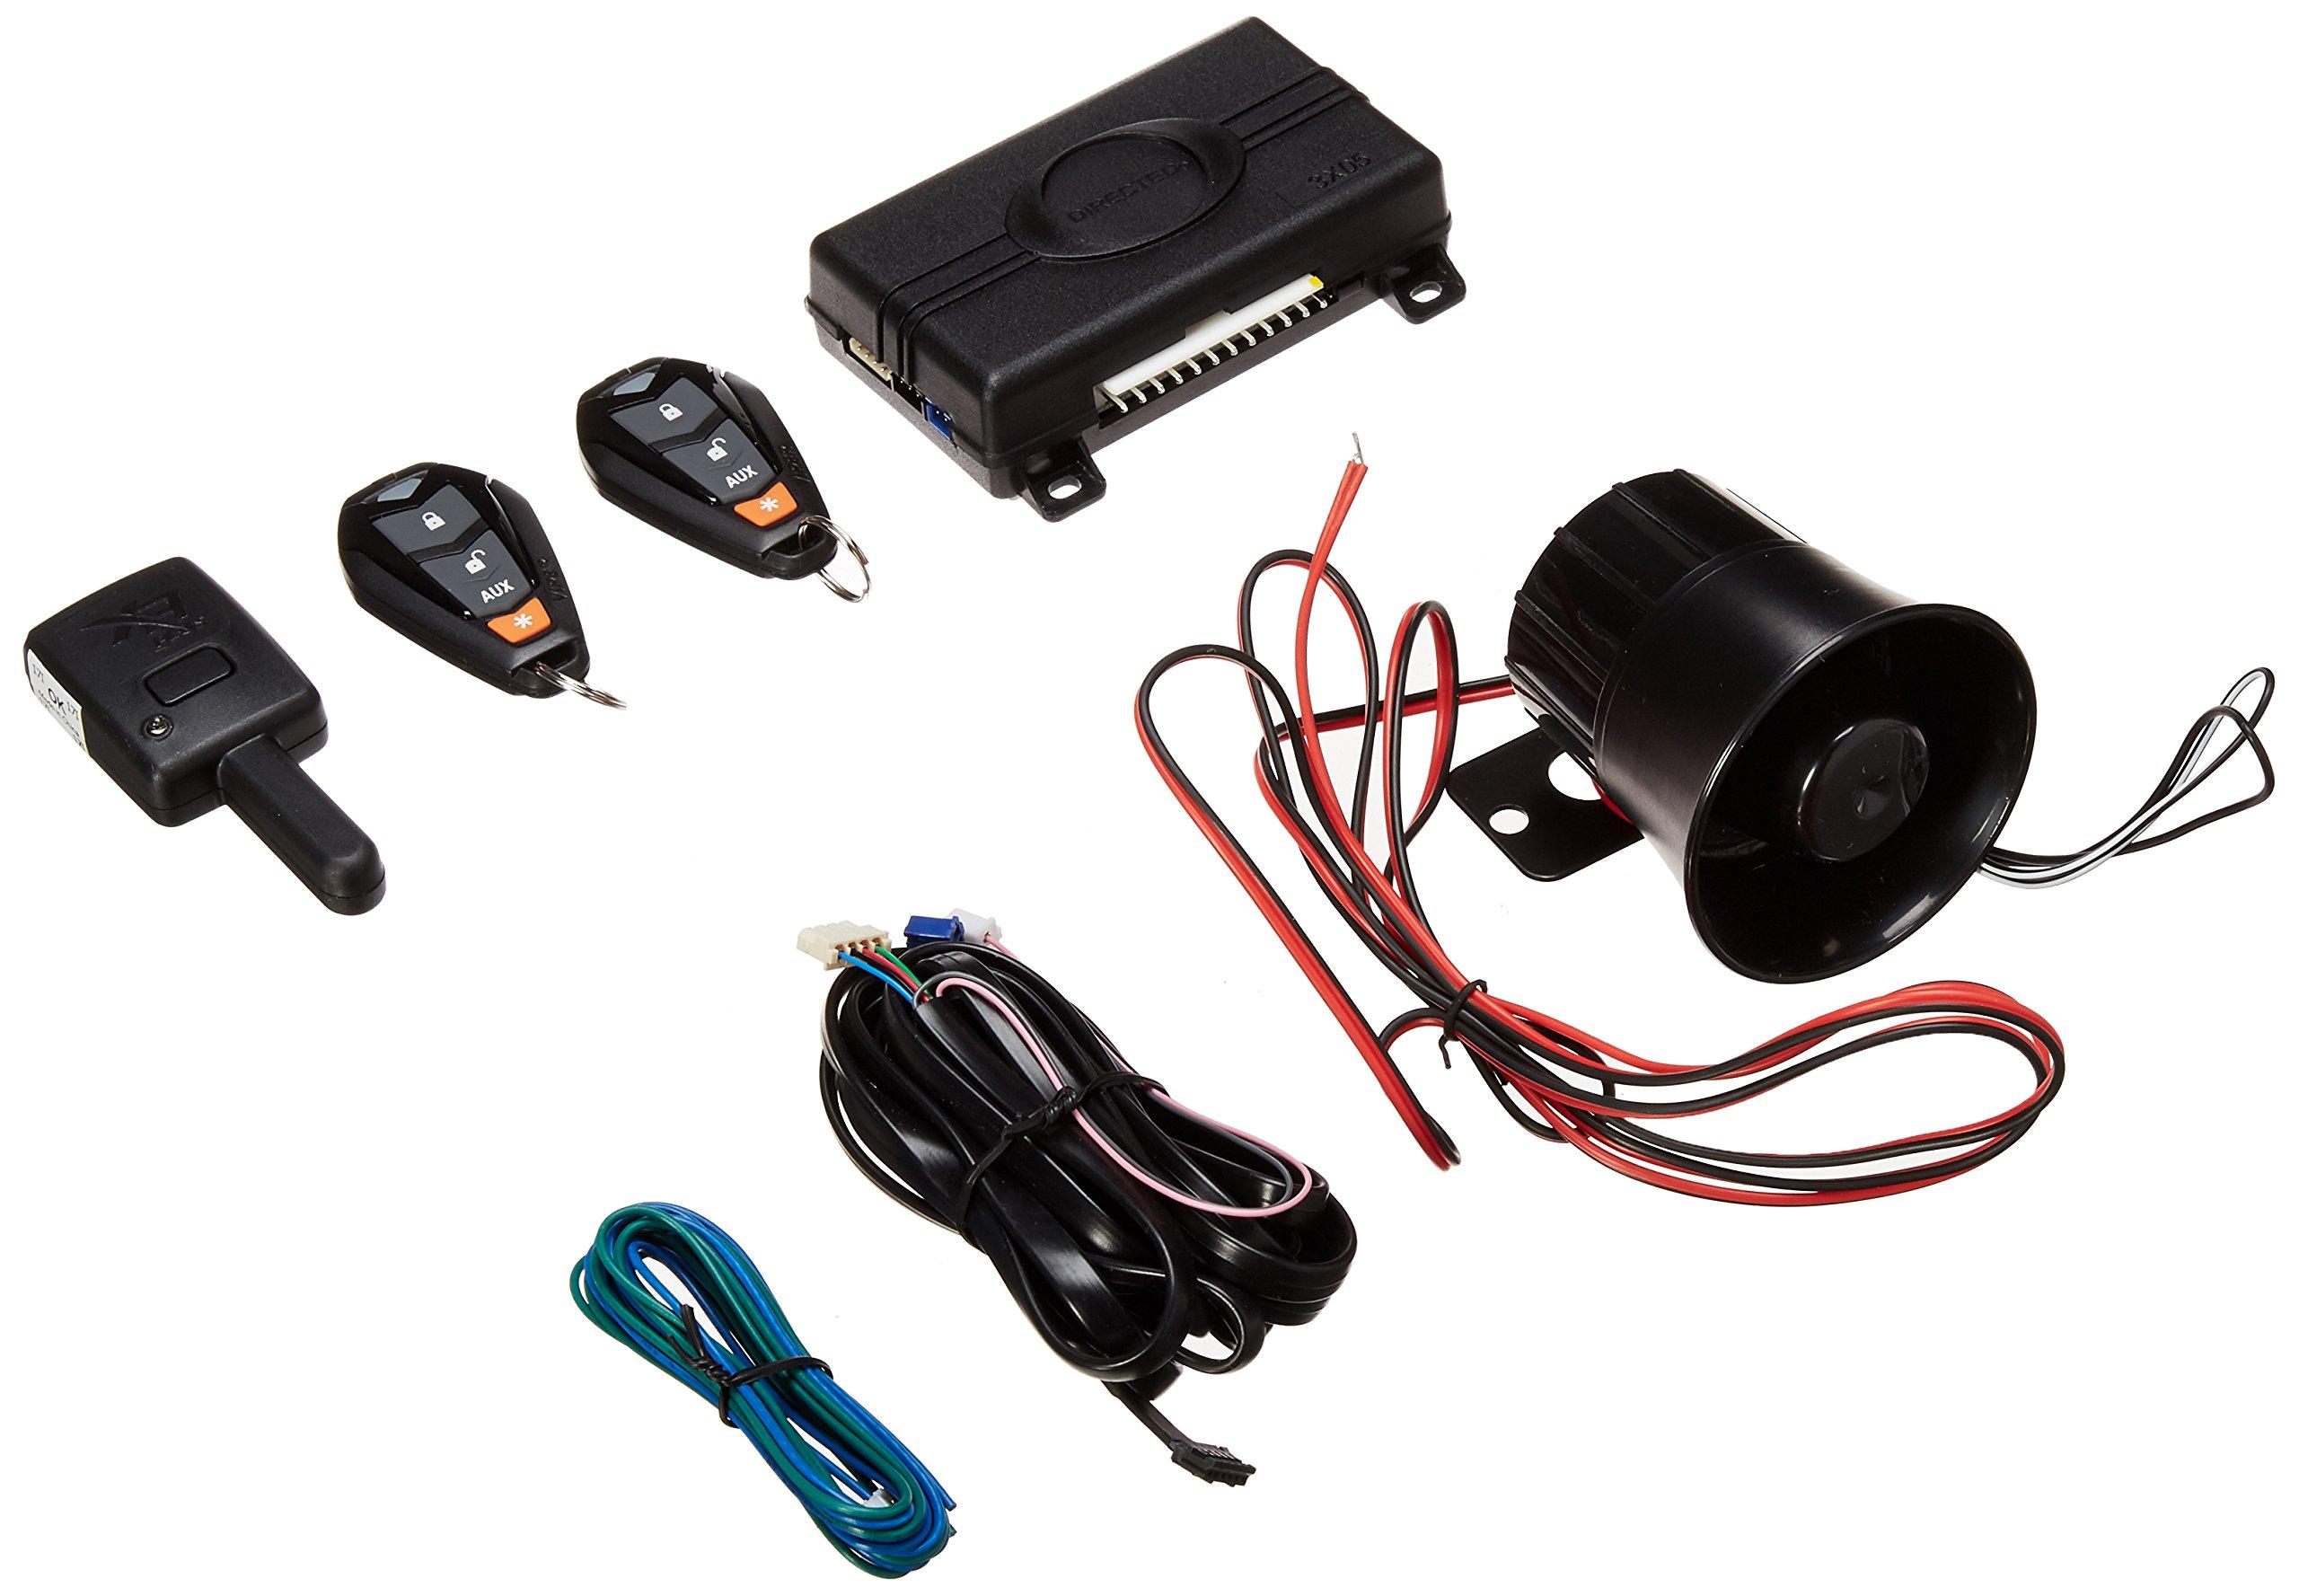 Viper 350 PLUS 3105V 1-Way Car Alarm Keyless Entry by Viper (Image #1)